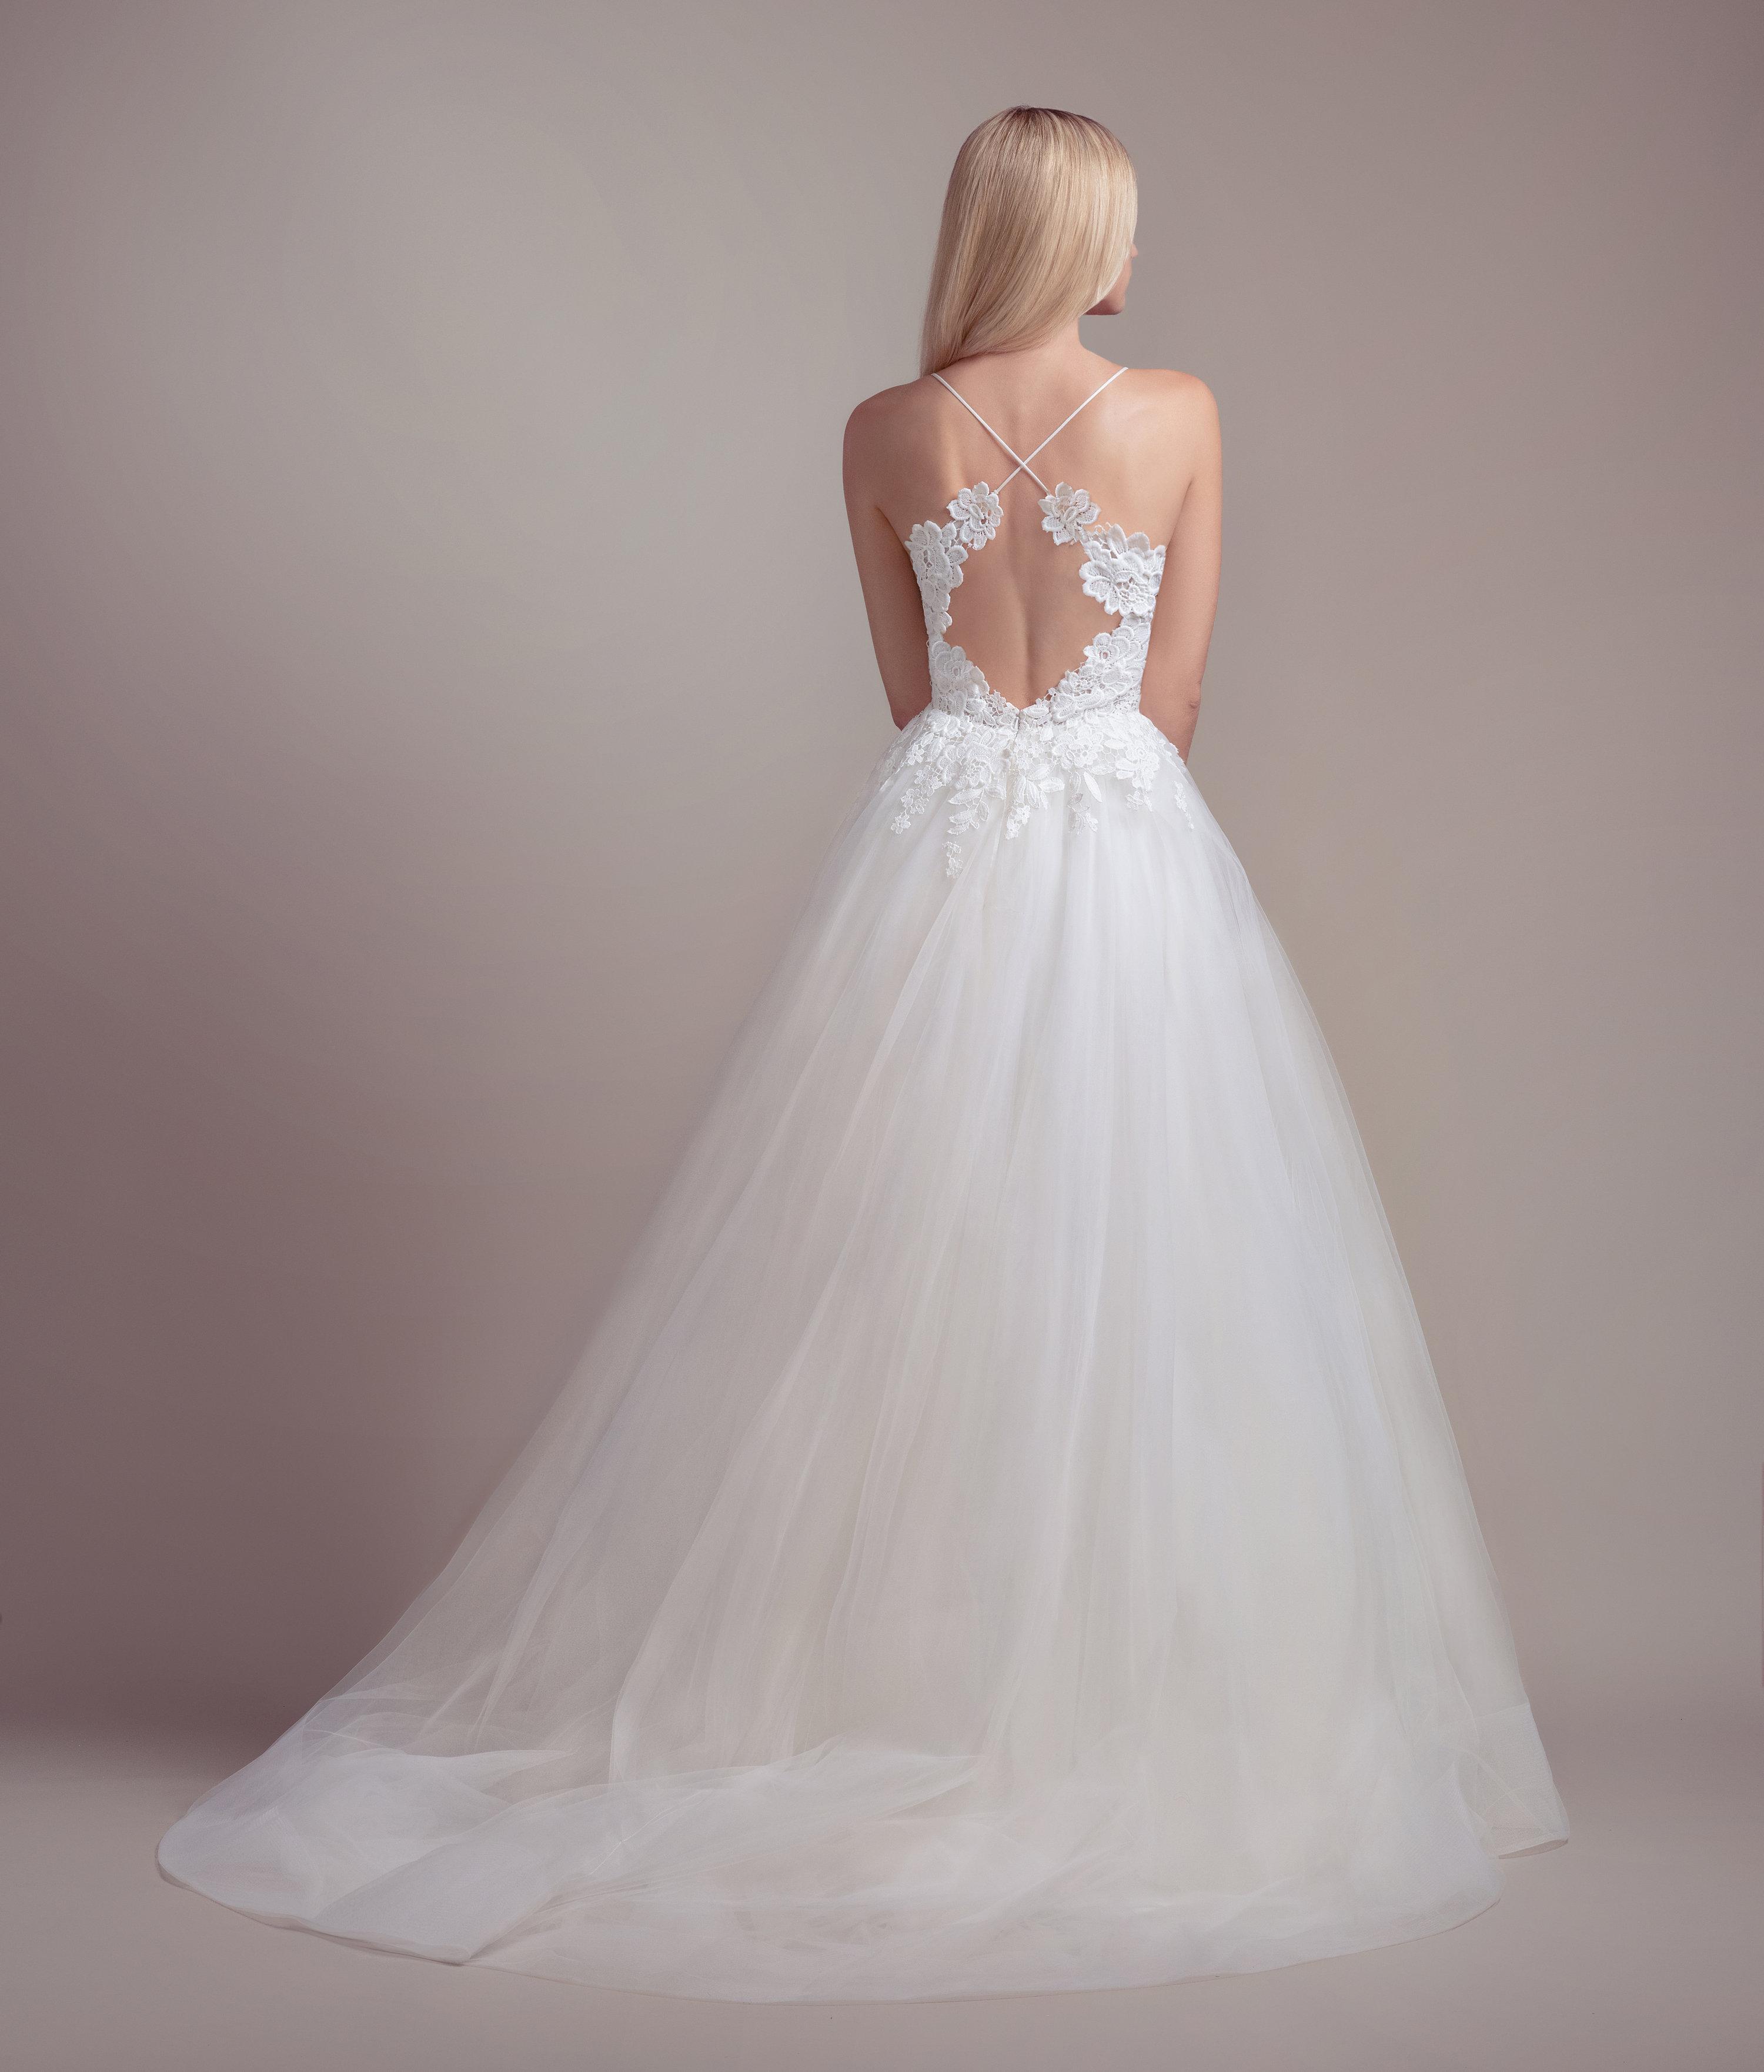 Bodice Wedding Gown: Lace Bodice Spaghetti Strap Ball Gown Wedding Dress